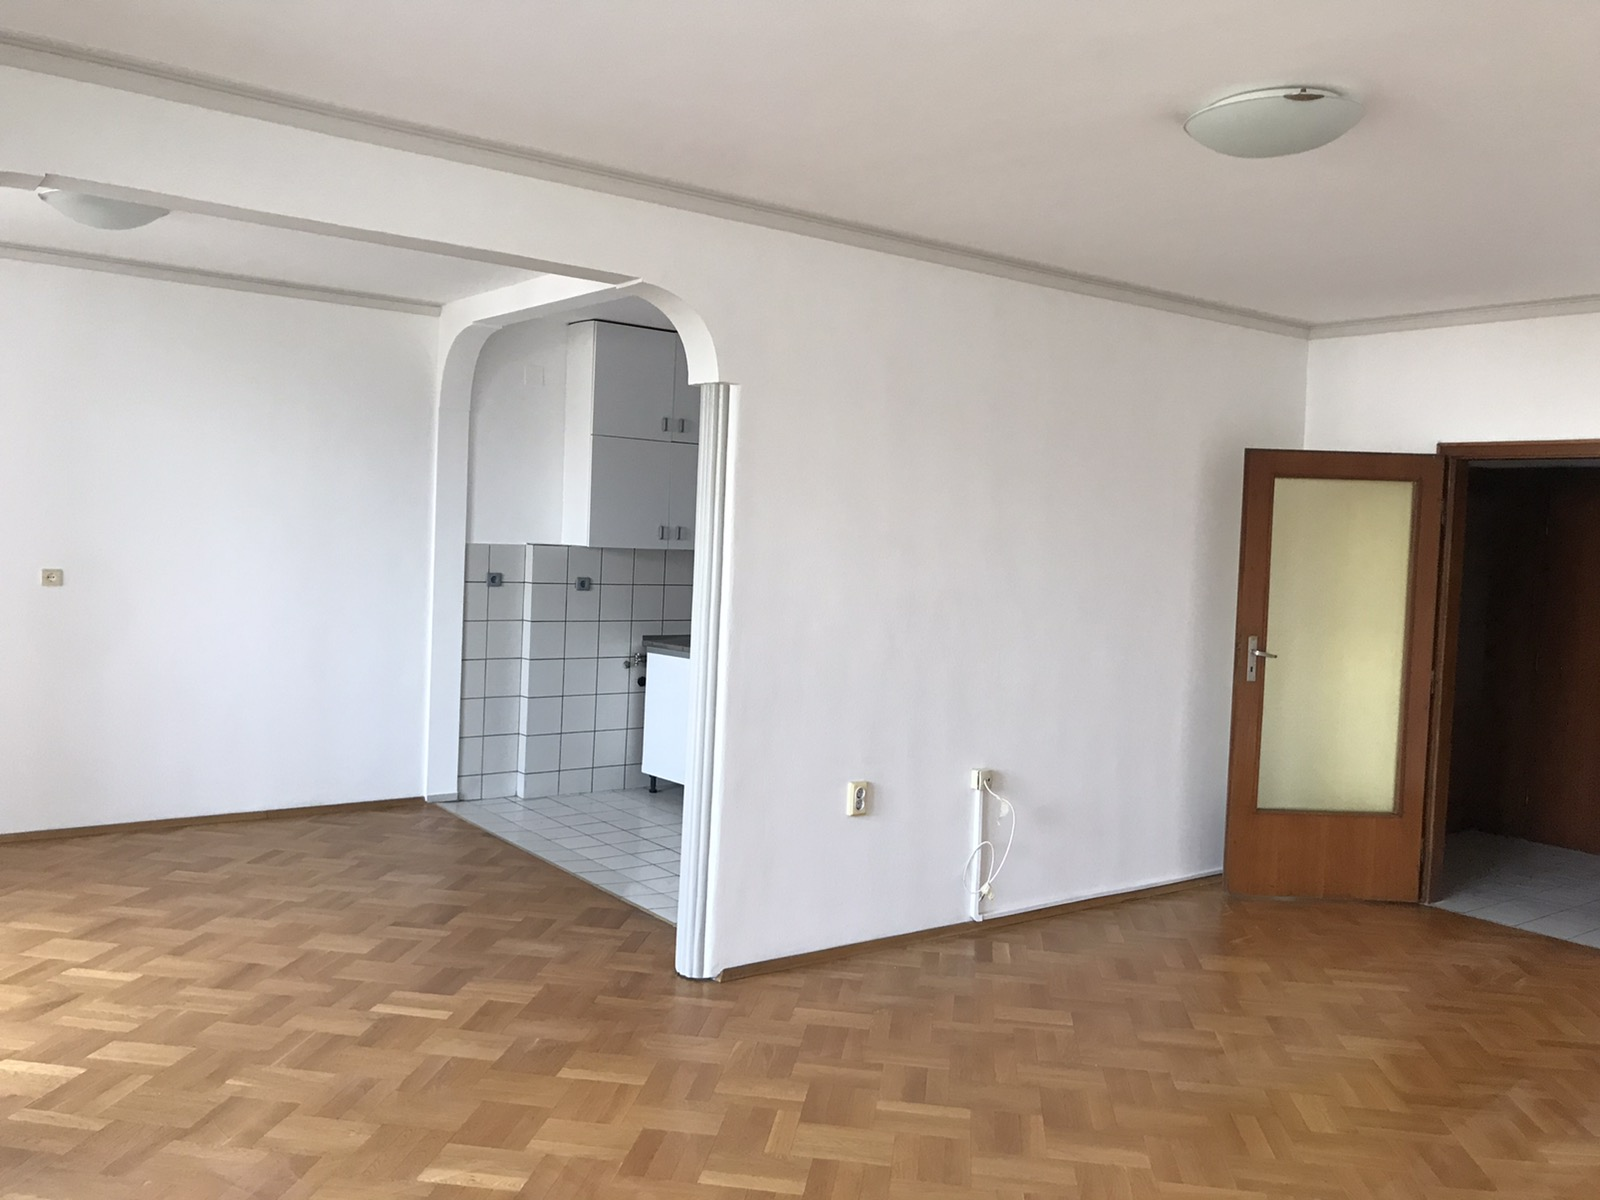 Тристаен апартамент под наем в кв. Изток, гр. София